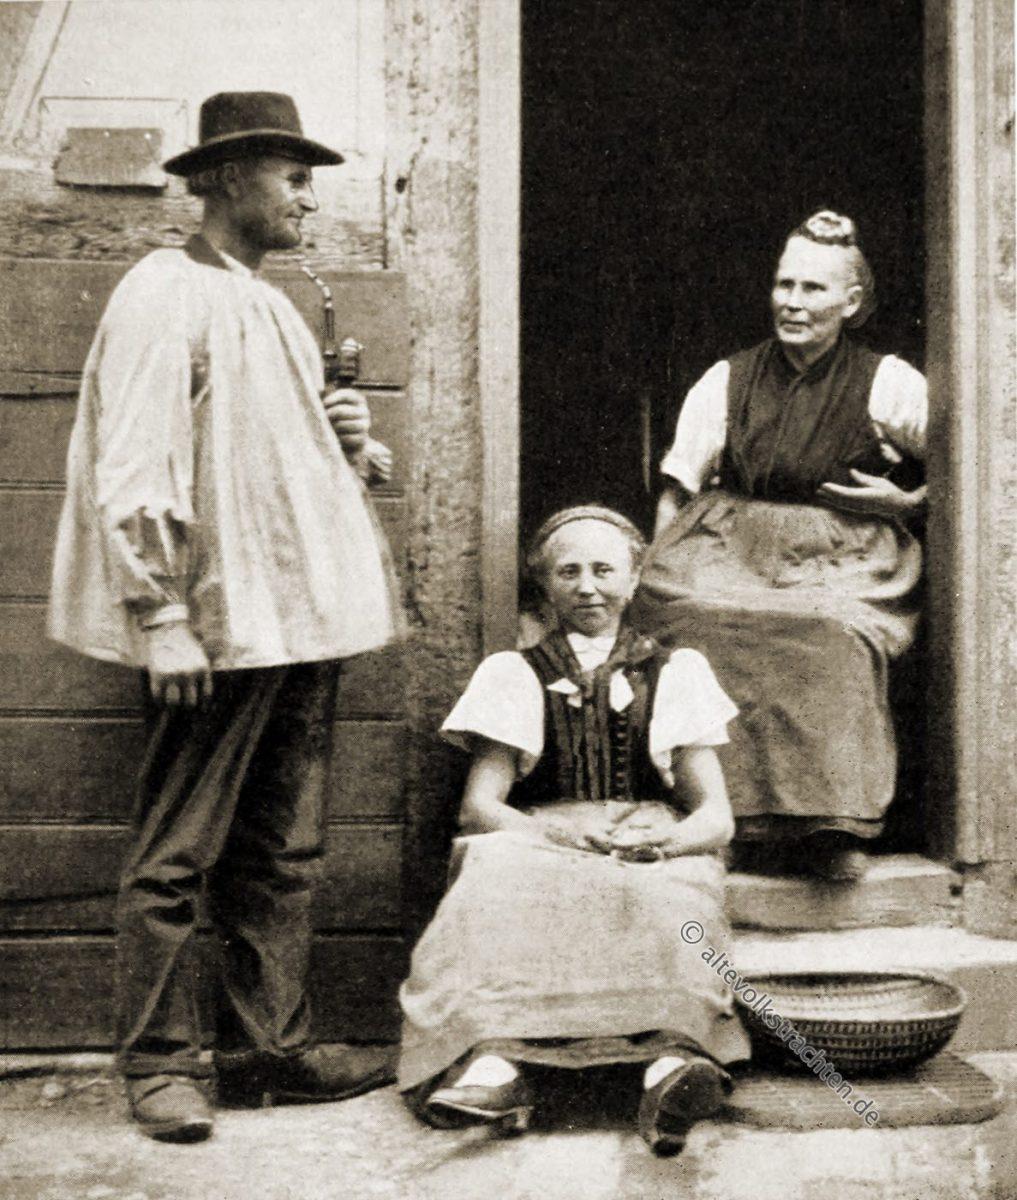 Haustracht, Hessen, Hessenfamilie, Schnatz, Trachten, Rose Julien, Deutsche Volkstrachten,